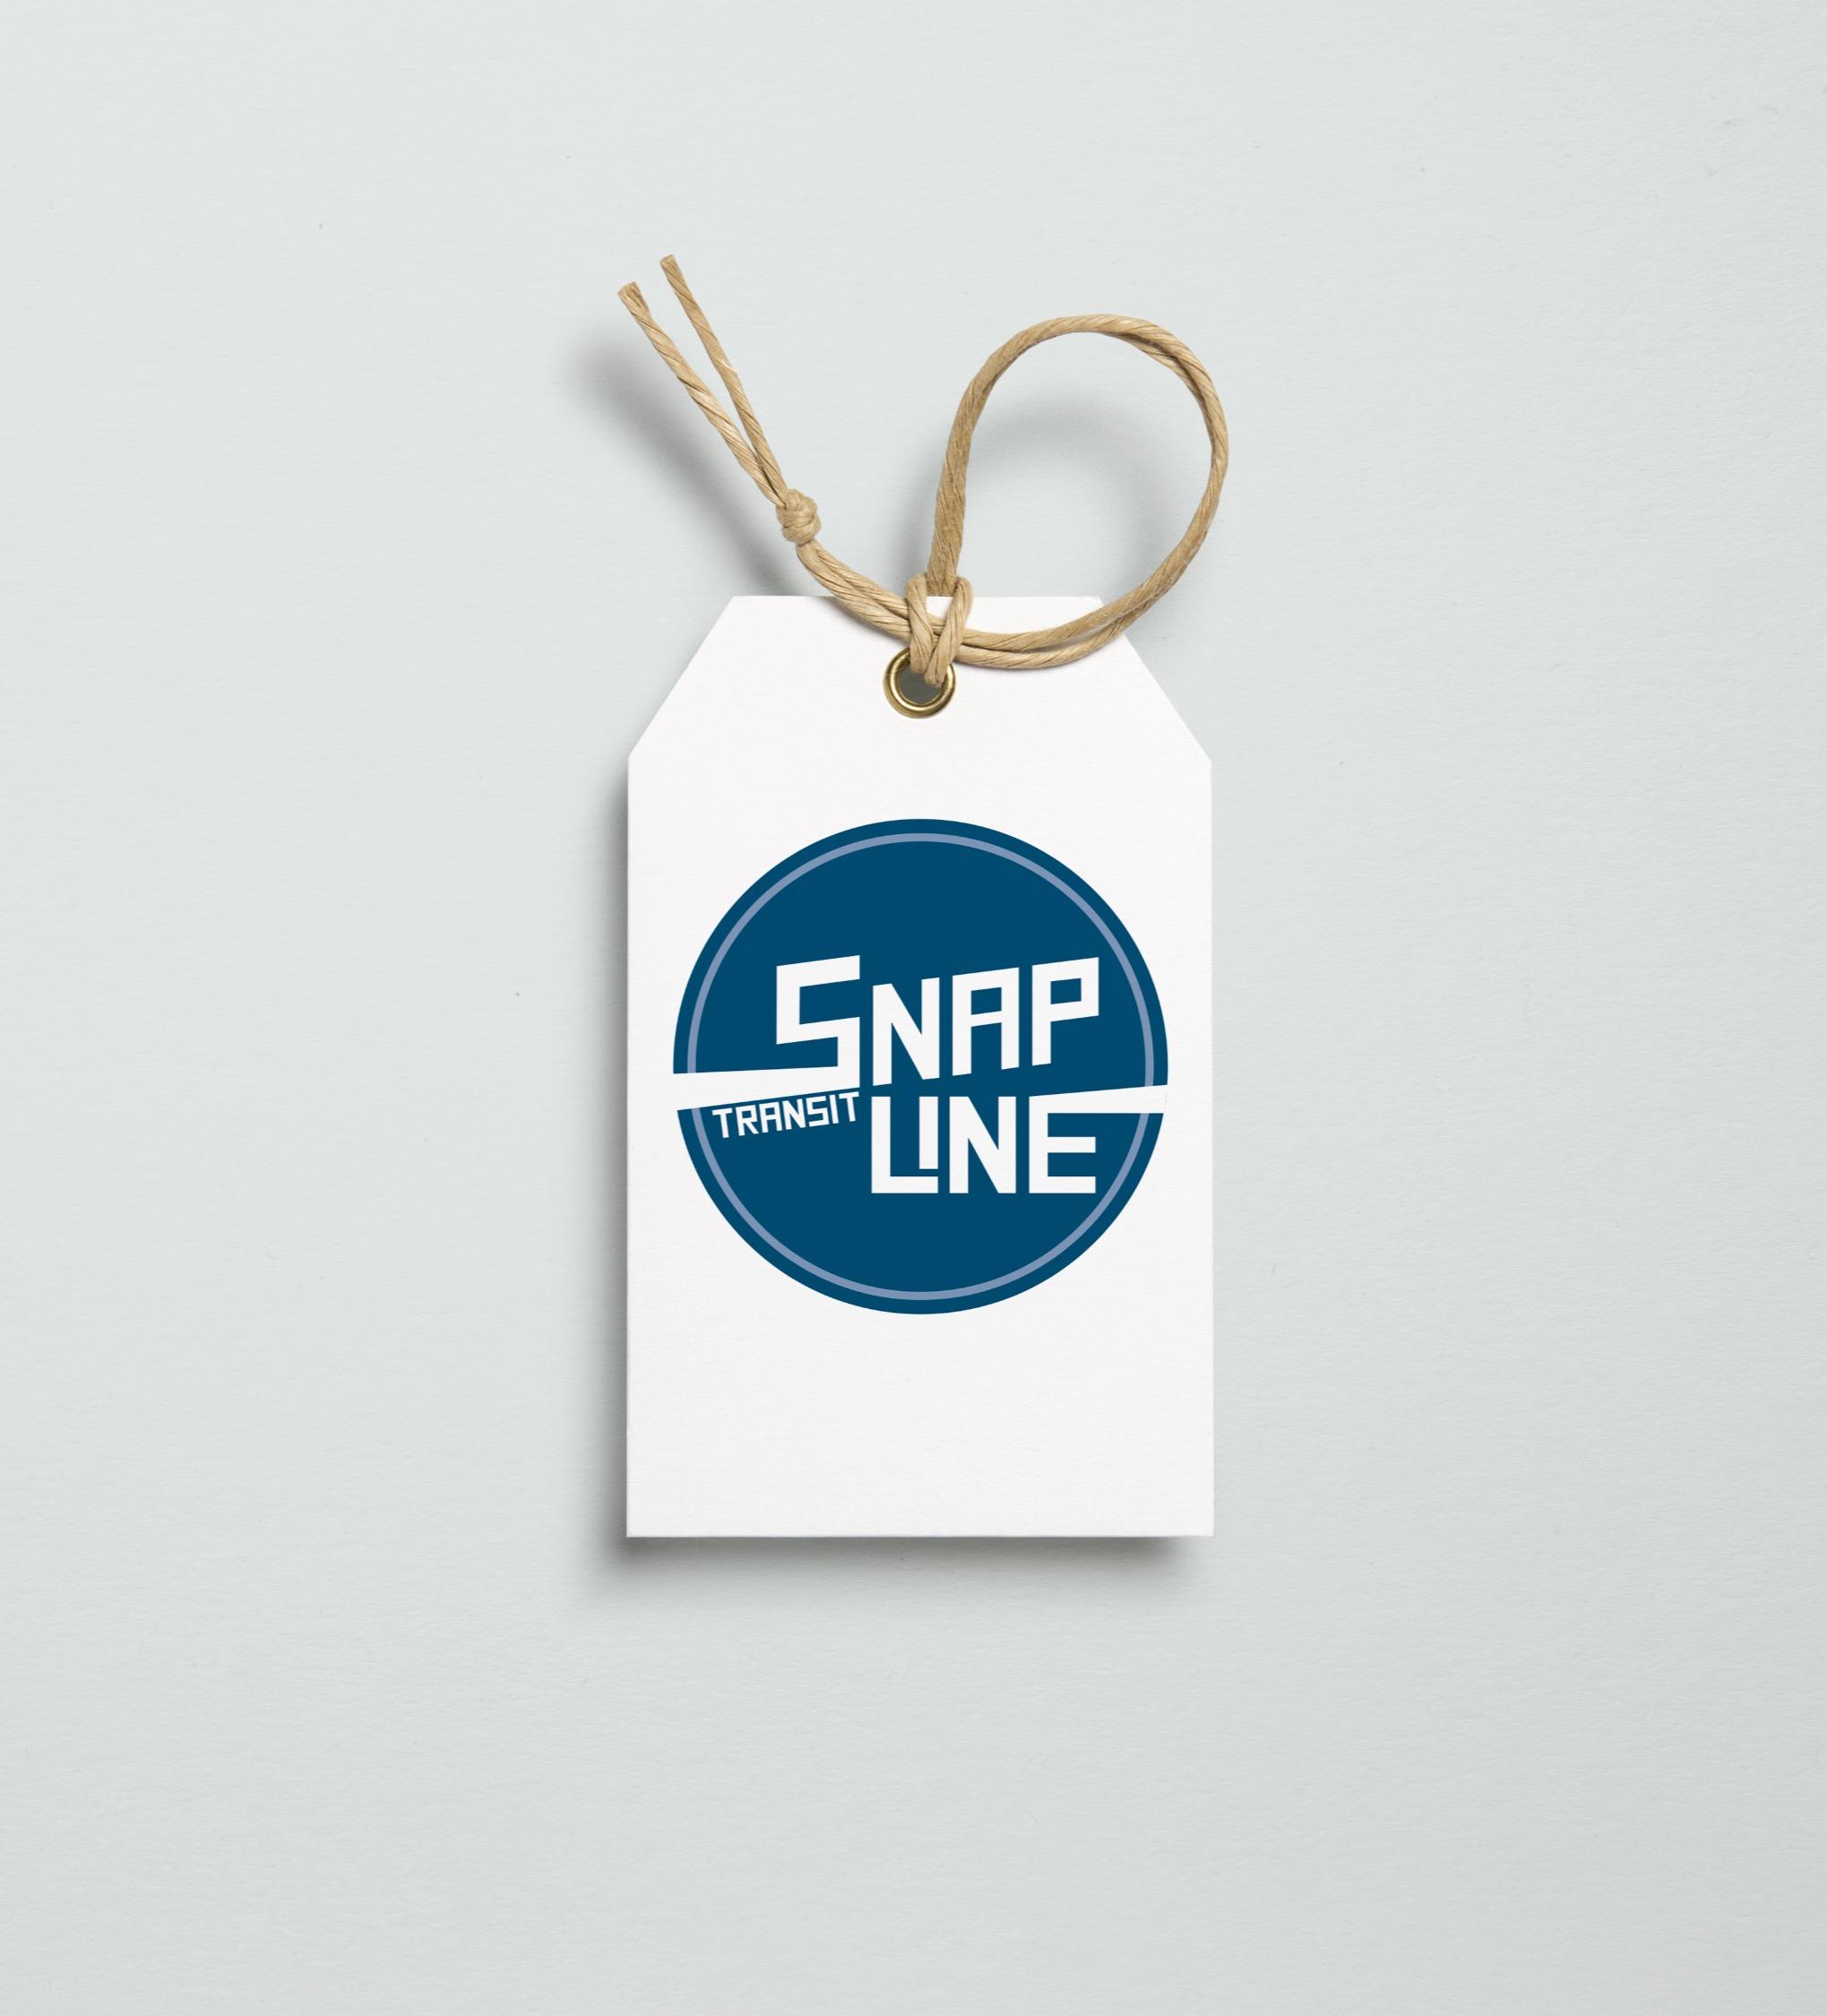 Snap Line Transit Branding